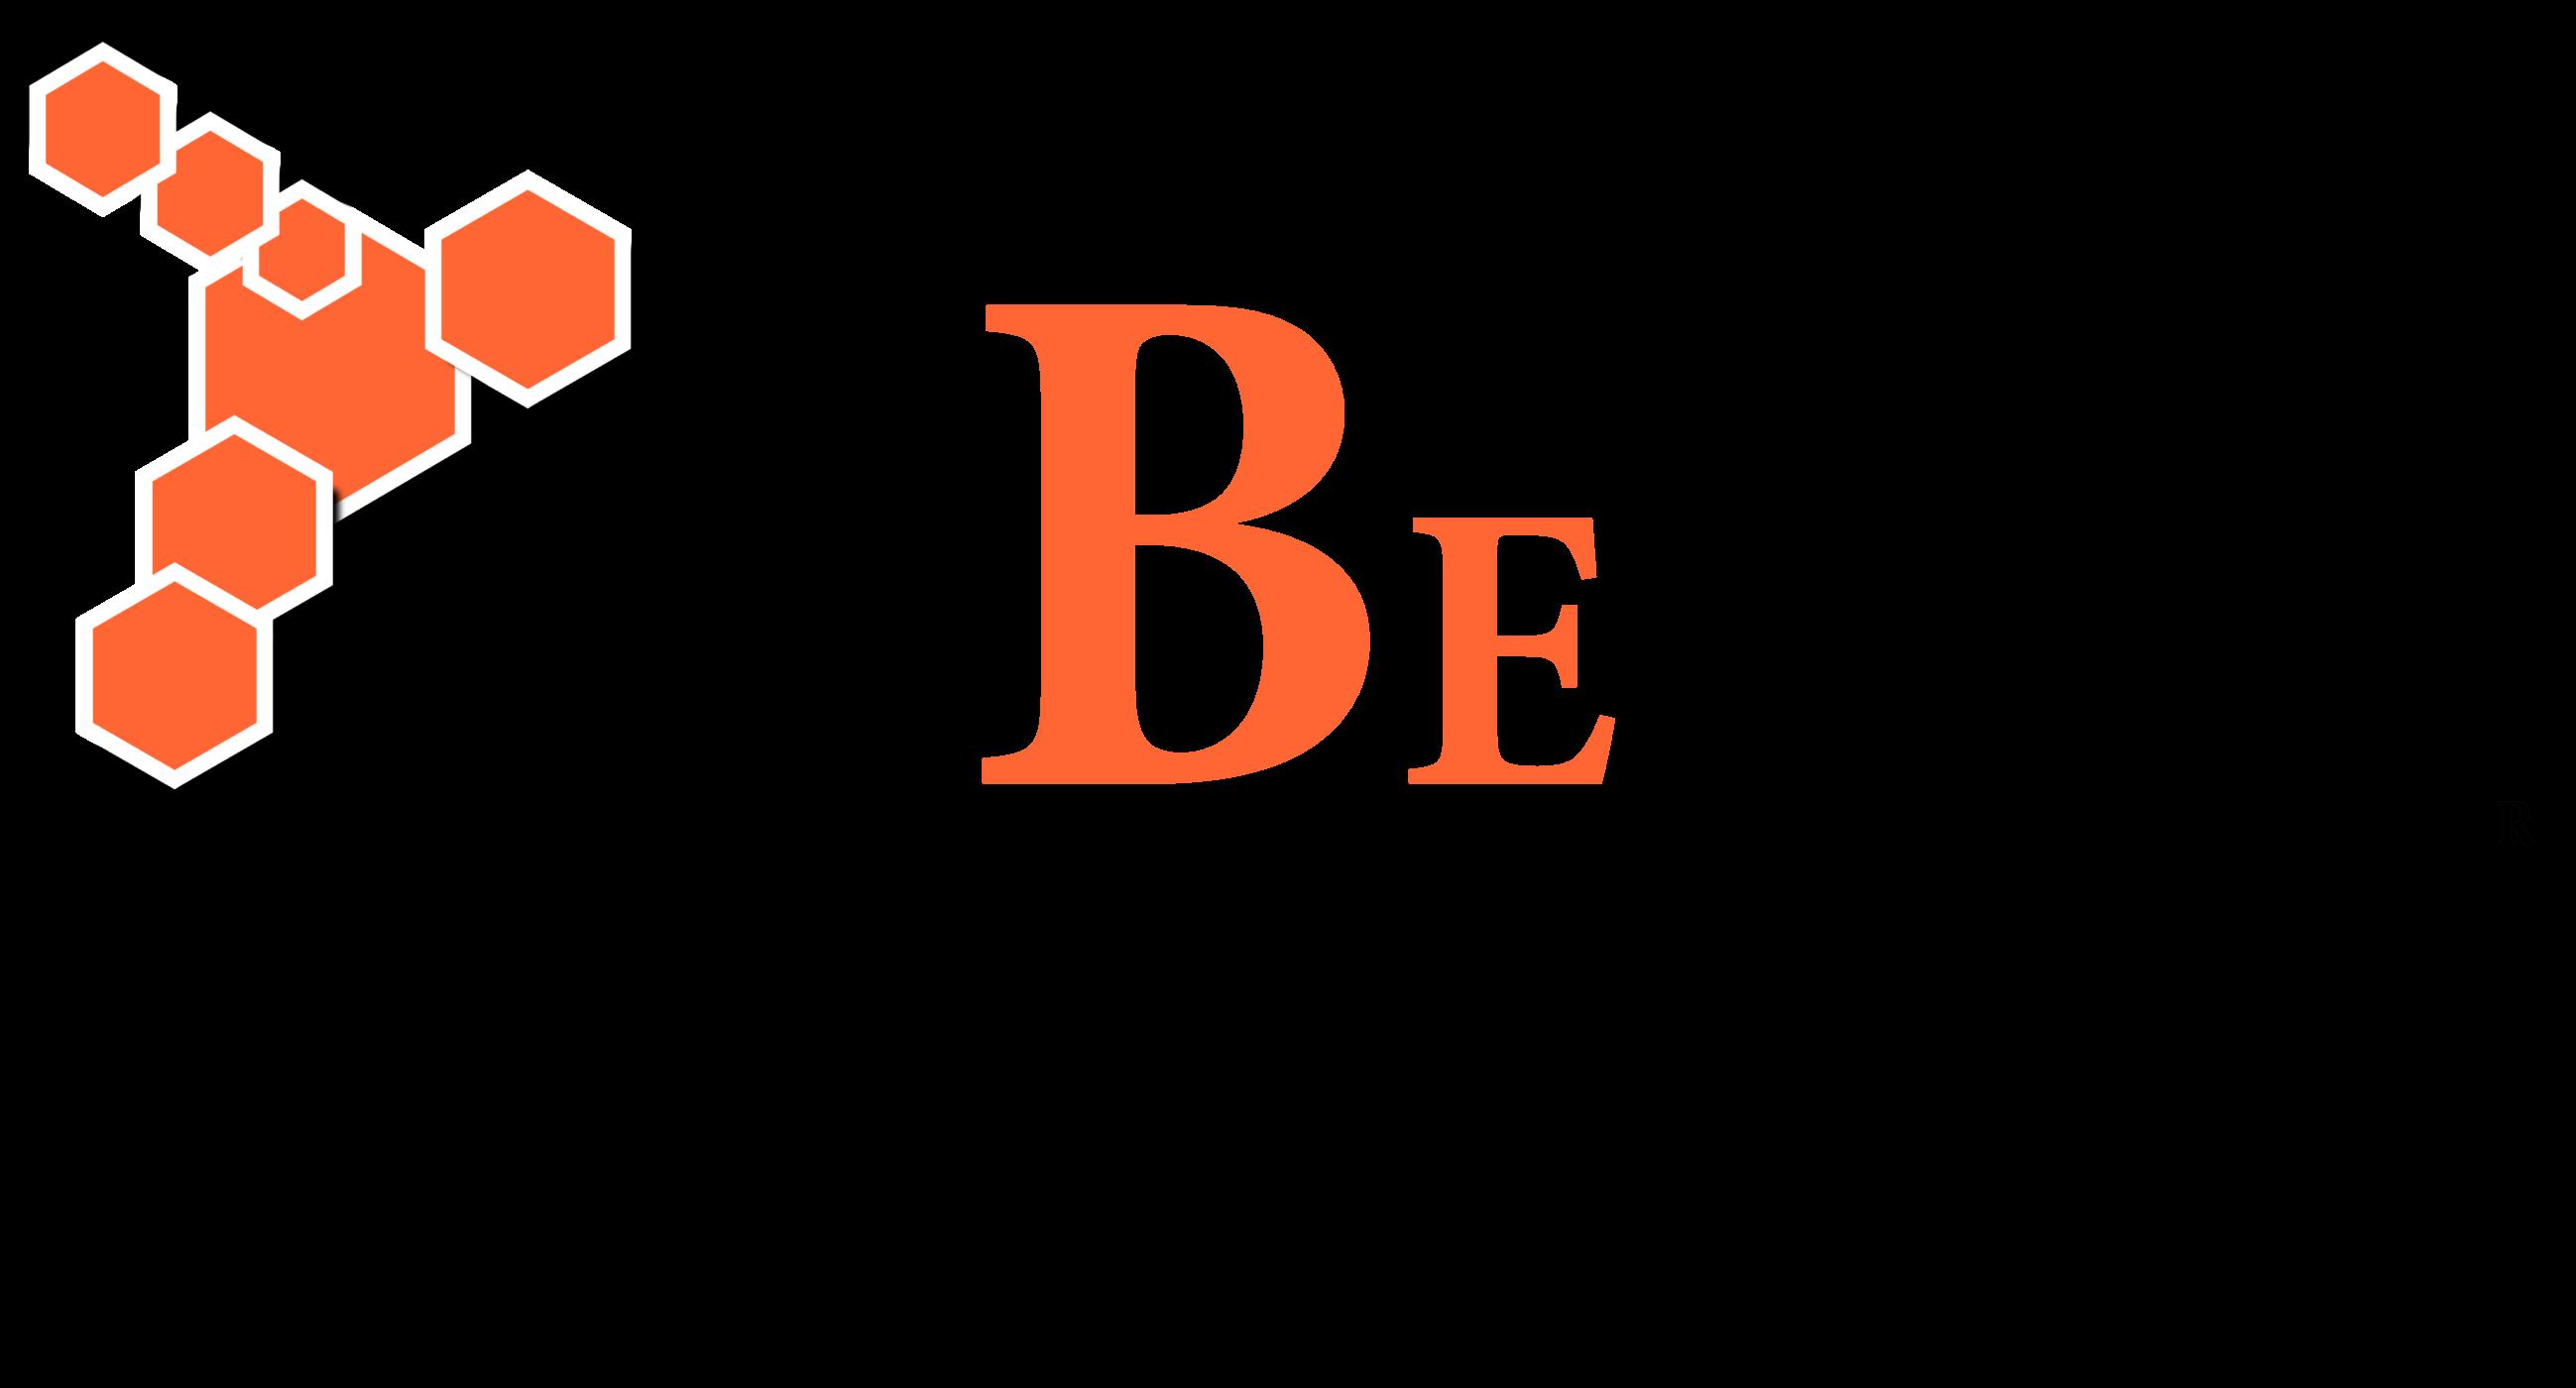 BeE Dynamic Statistics